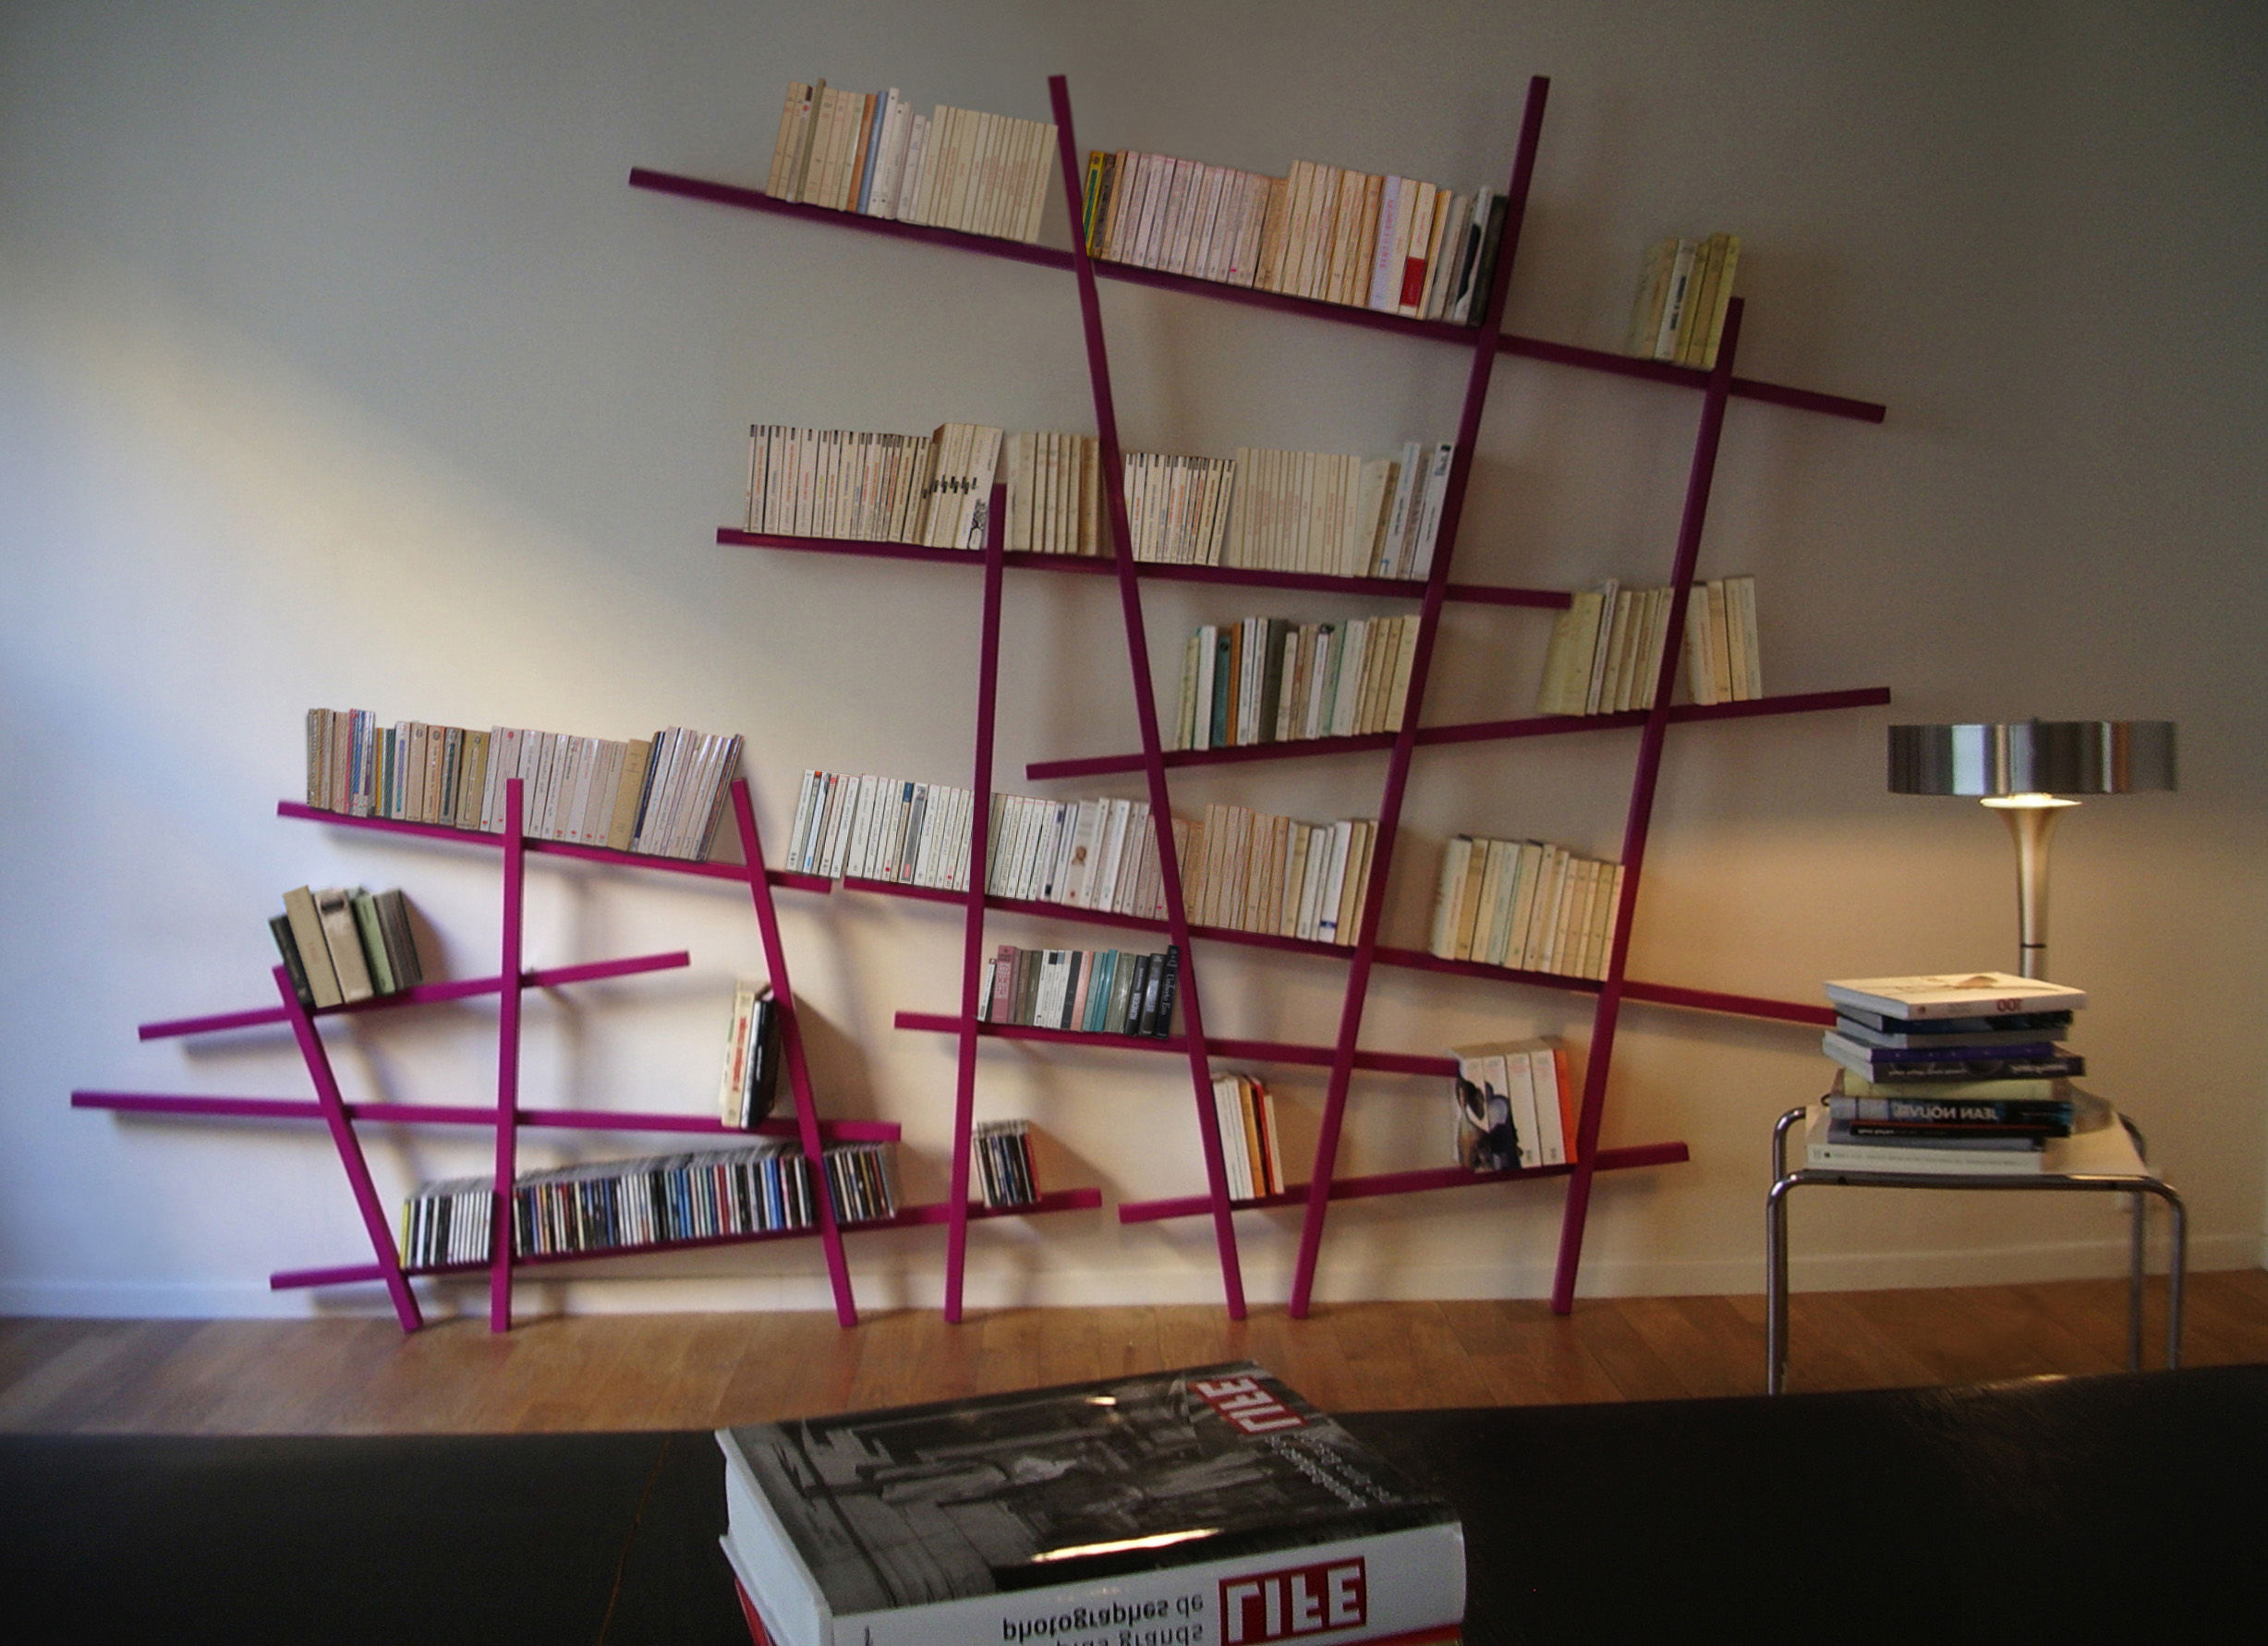 biblioth que mikado large l 215 x h 220 cm rouge compagnie. Black Bedroom Furniture Sets. Home Design Ideas